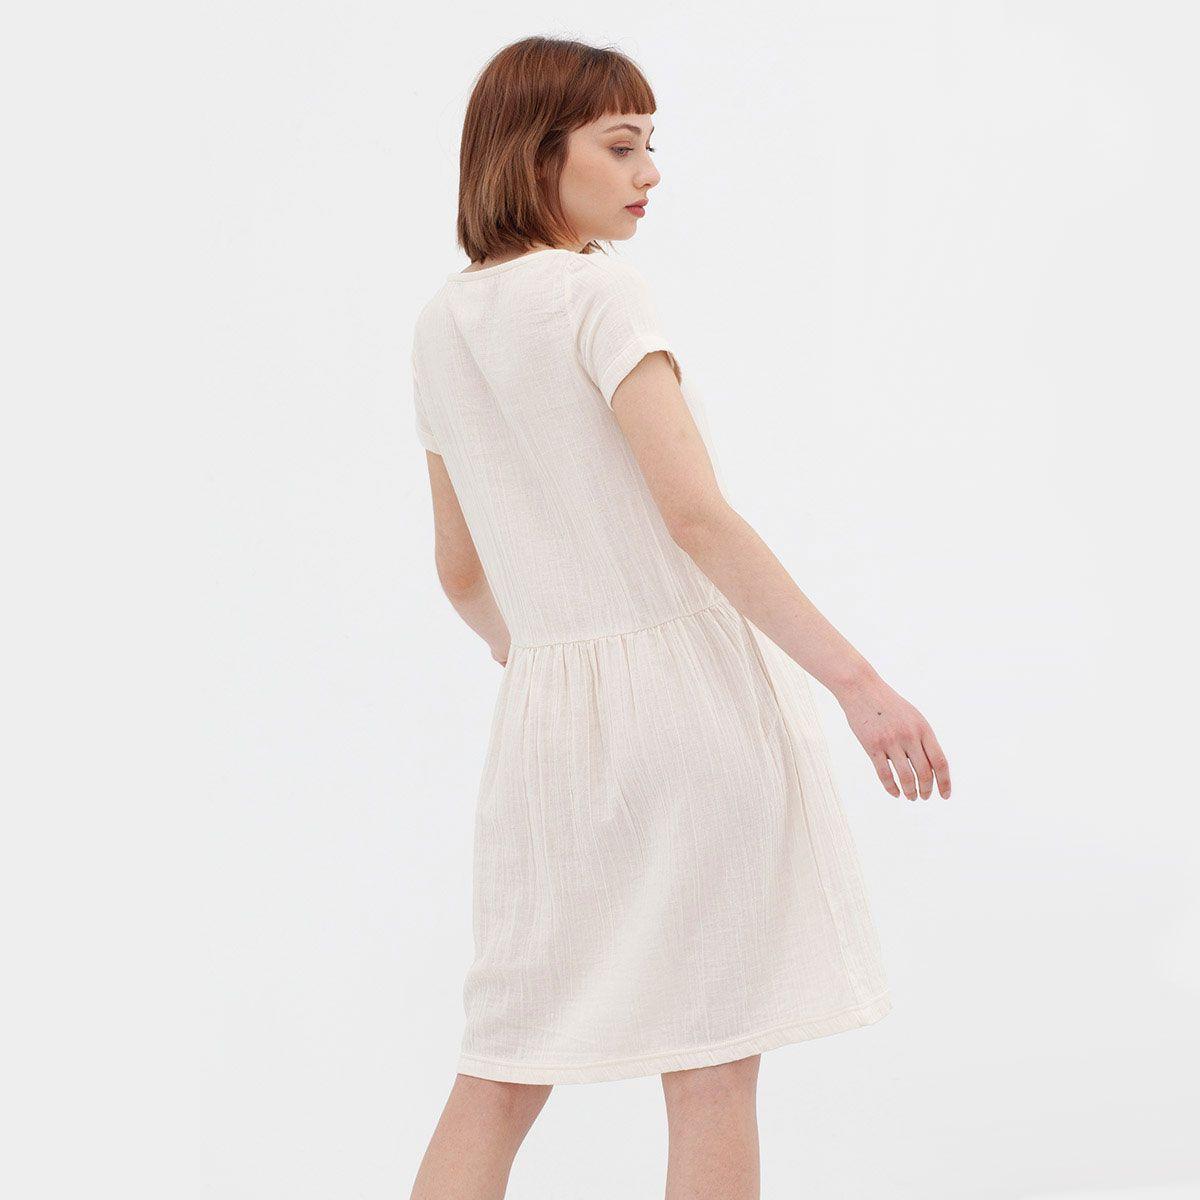 Espalda vestido blanco manga corta de algodón orgánico